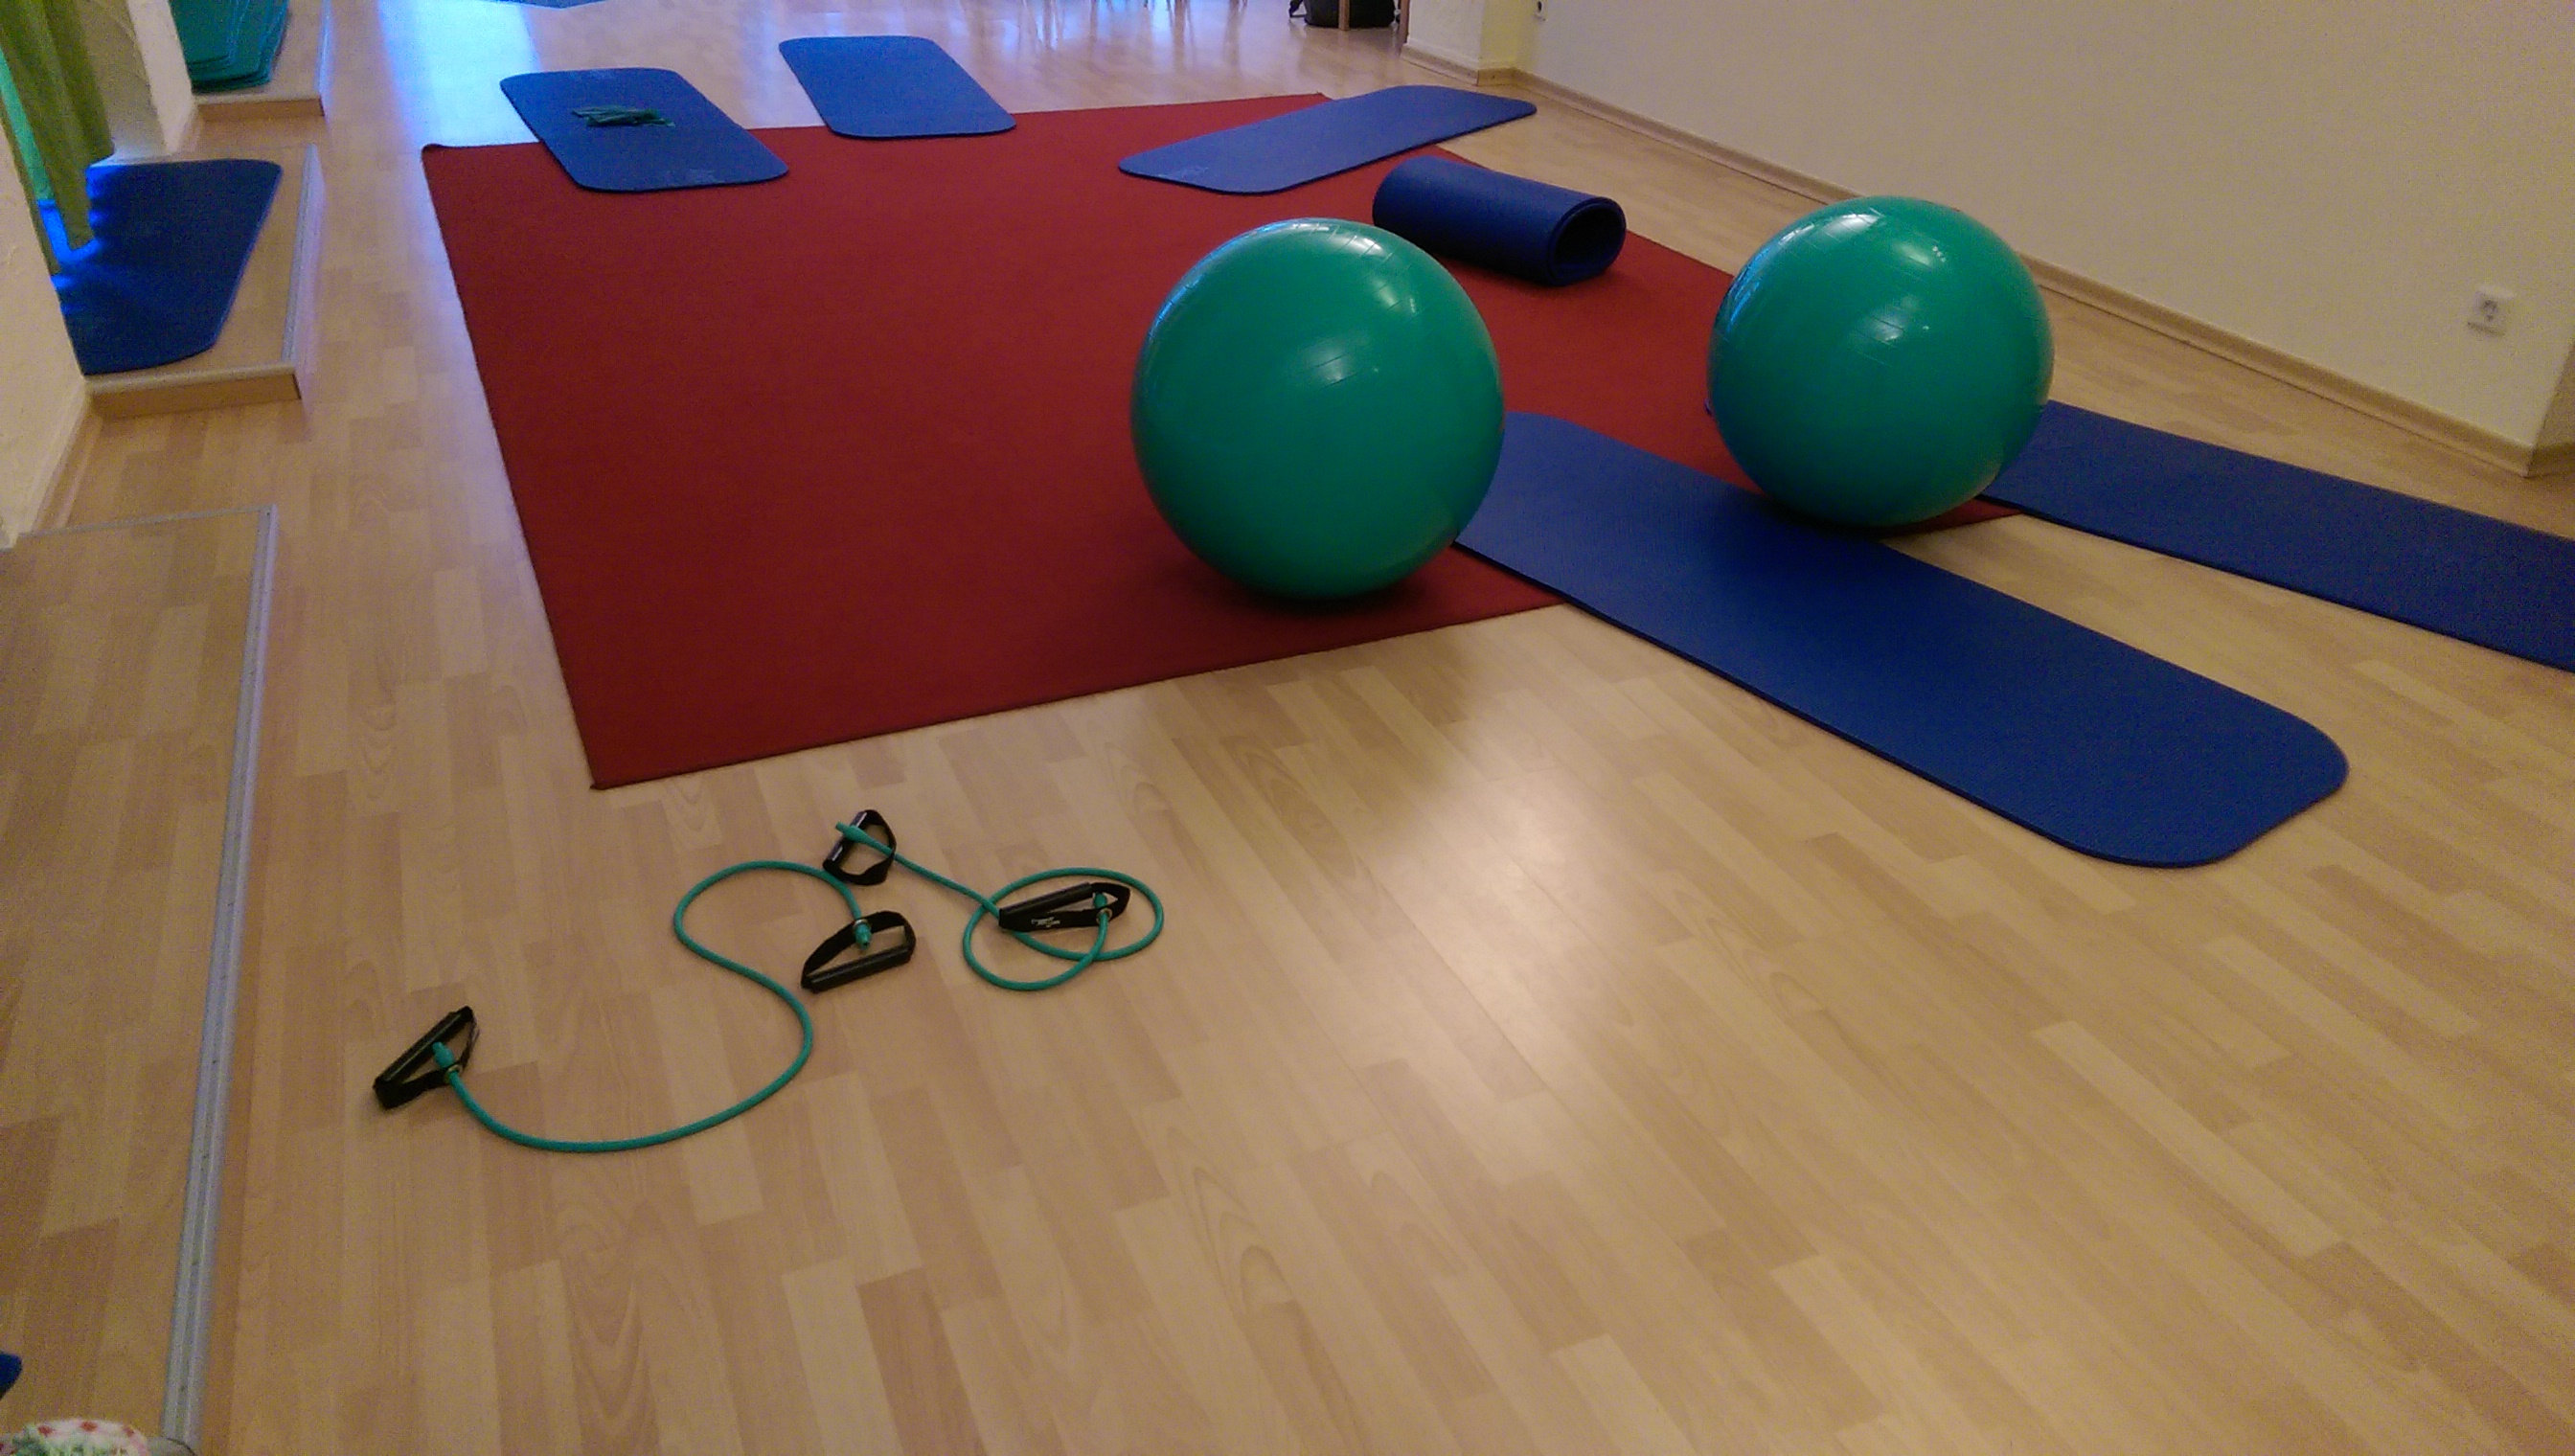 Rückbildungs-gymnastik / Beckenboden-gymnastik mit Baby